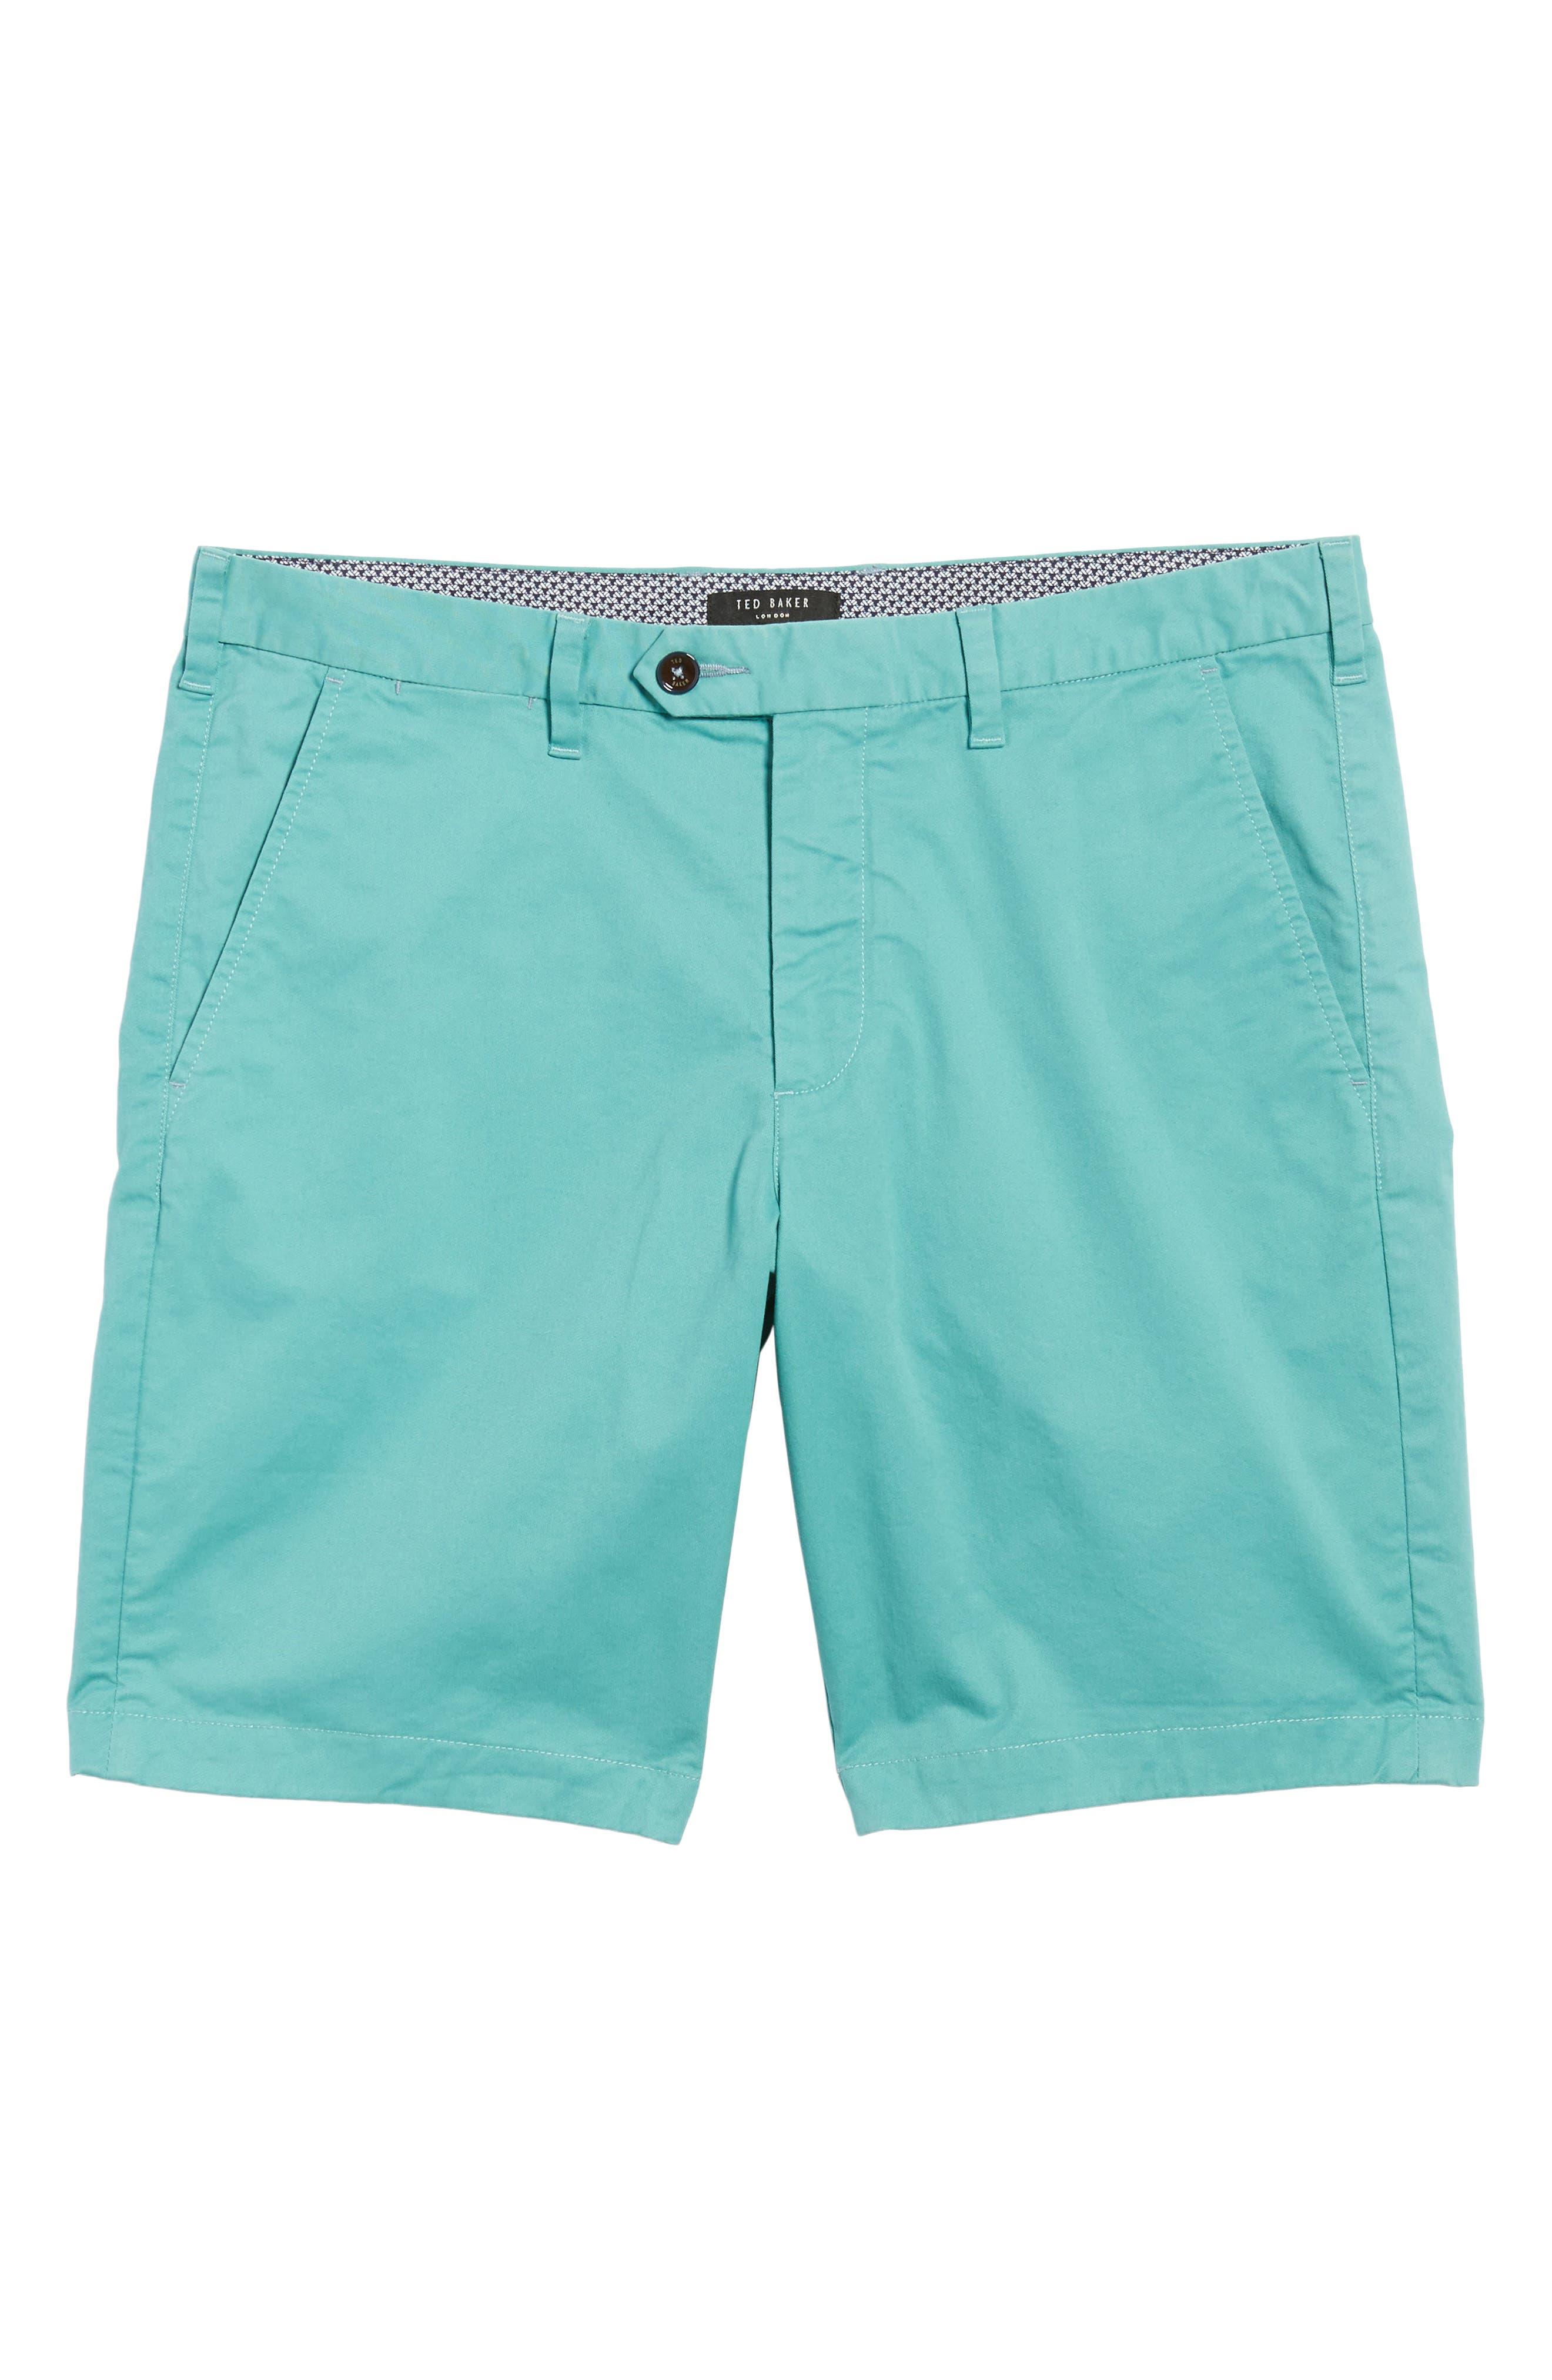 Proshtt Stretch Cotton Shorts,                             Alternate thumbnail 6, color,                             Pale Green